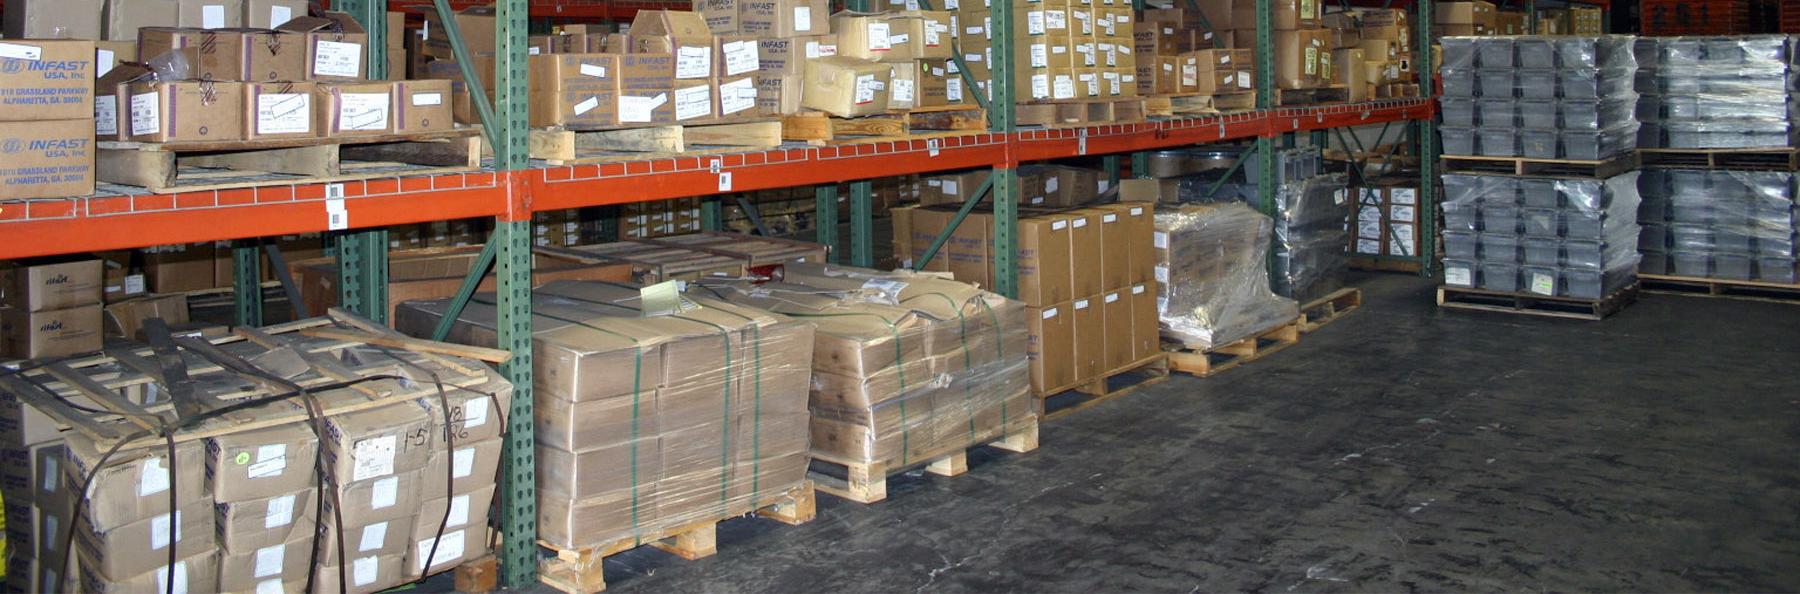 warehouse-12